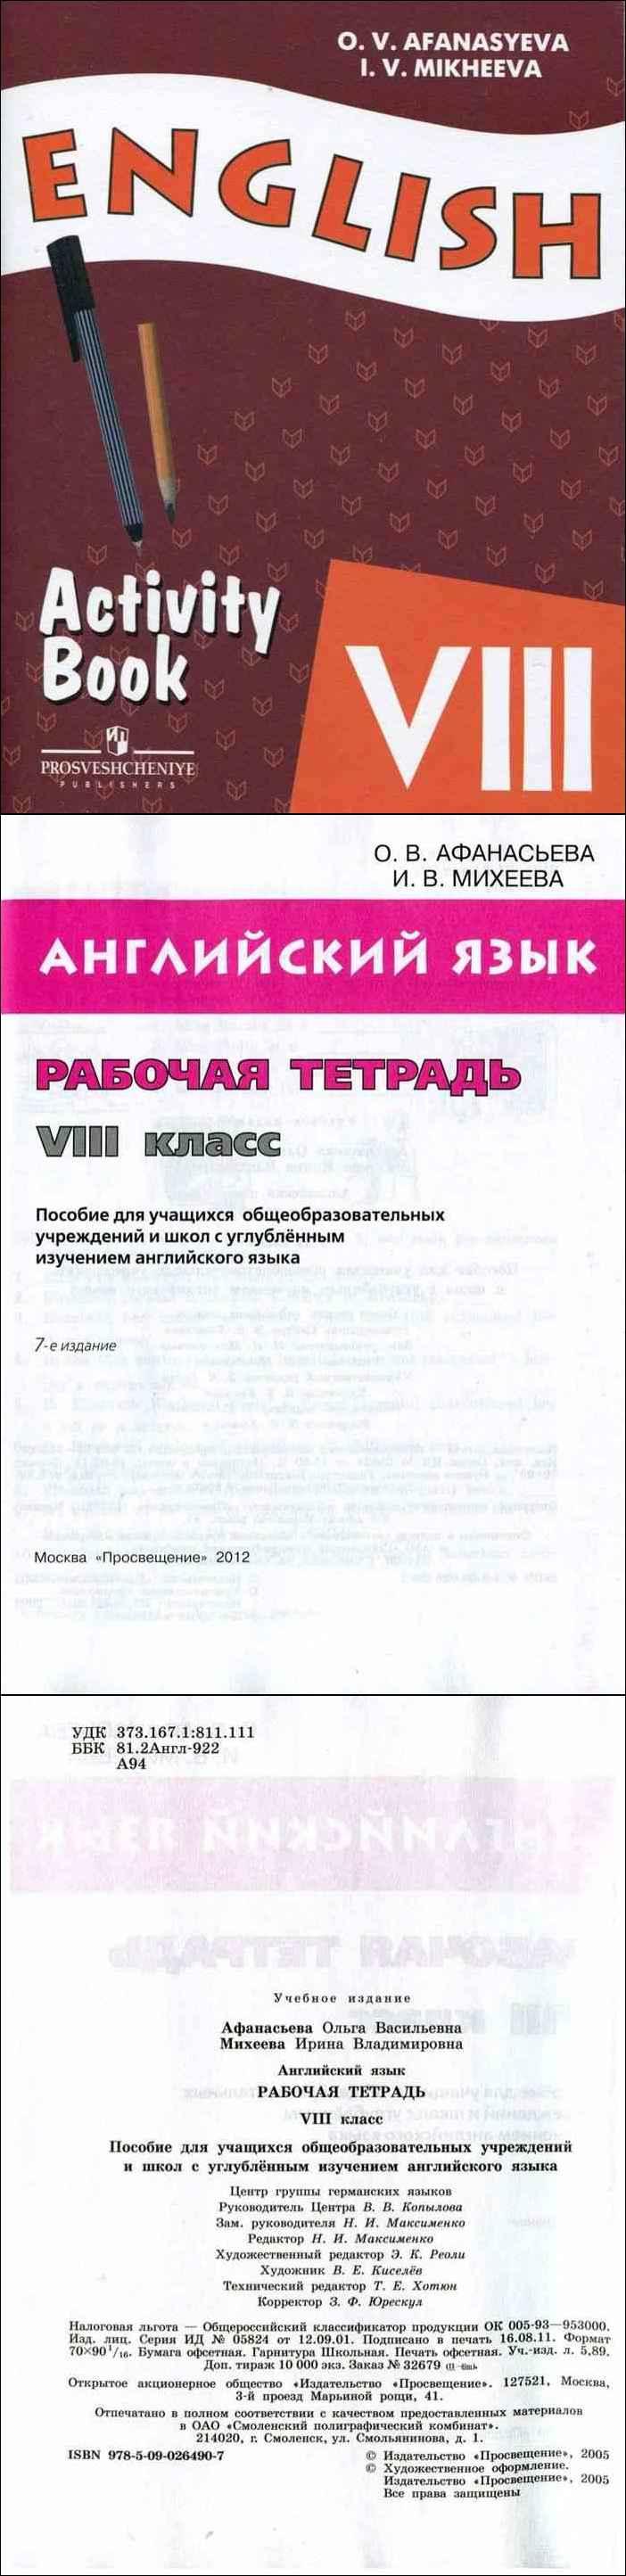 Activity book 10 класс афанасьева скачать pdf